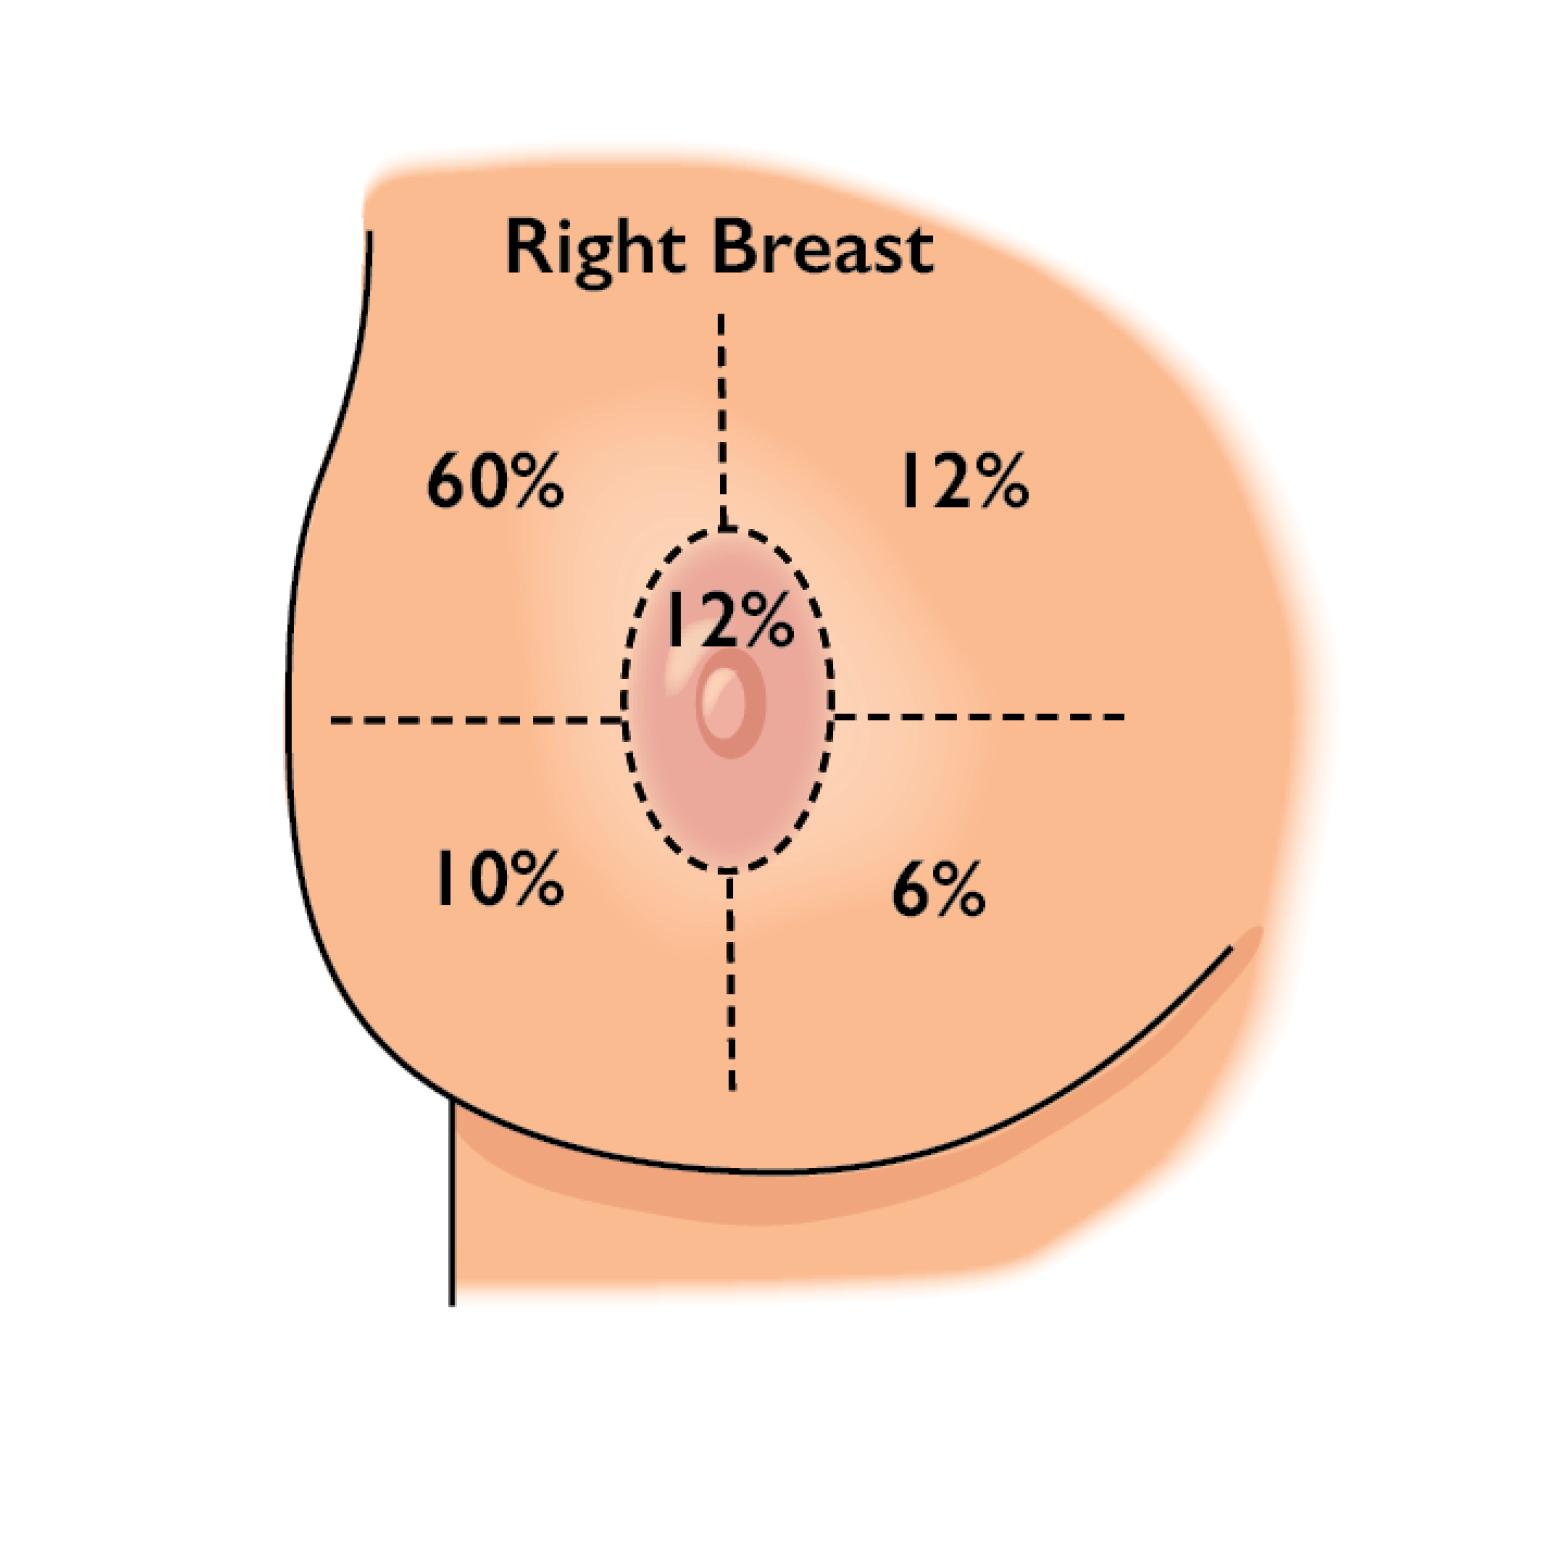 Breast Cancer Quadrant Image.png